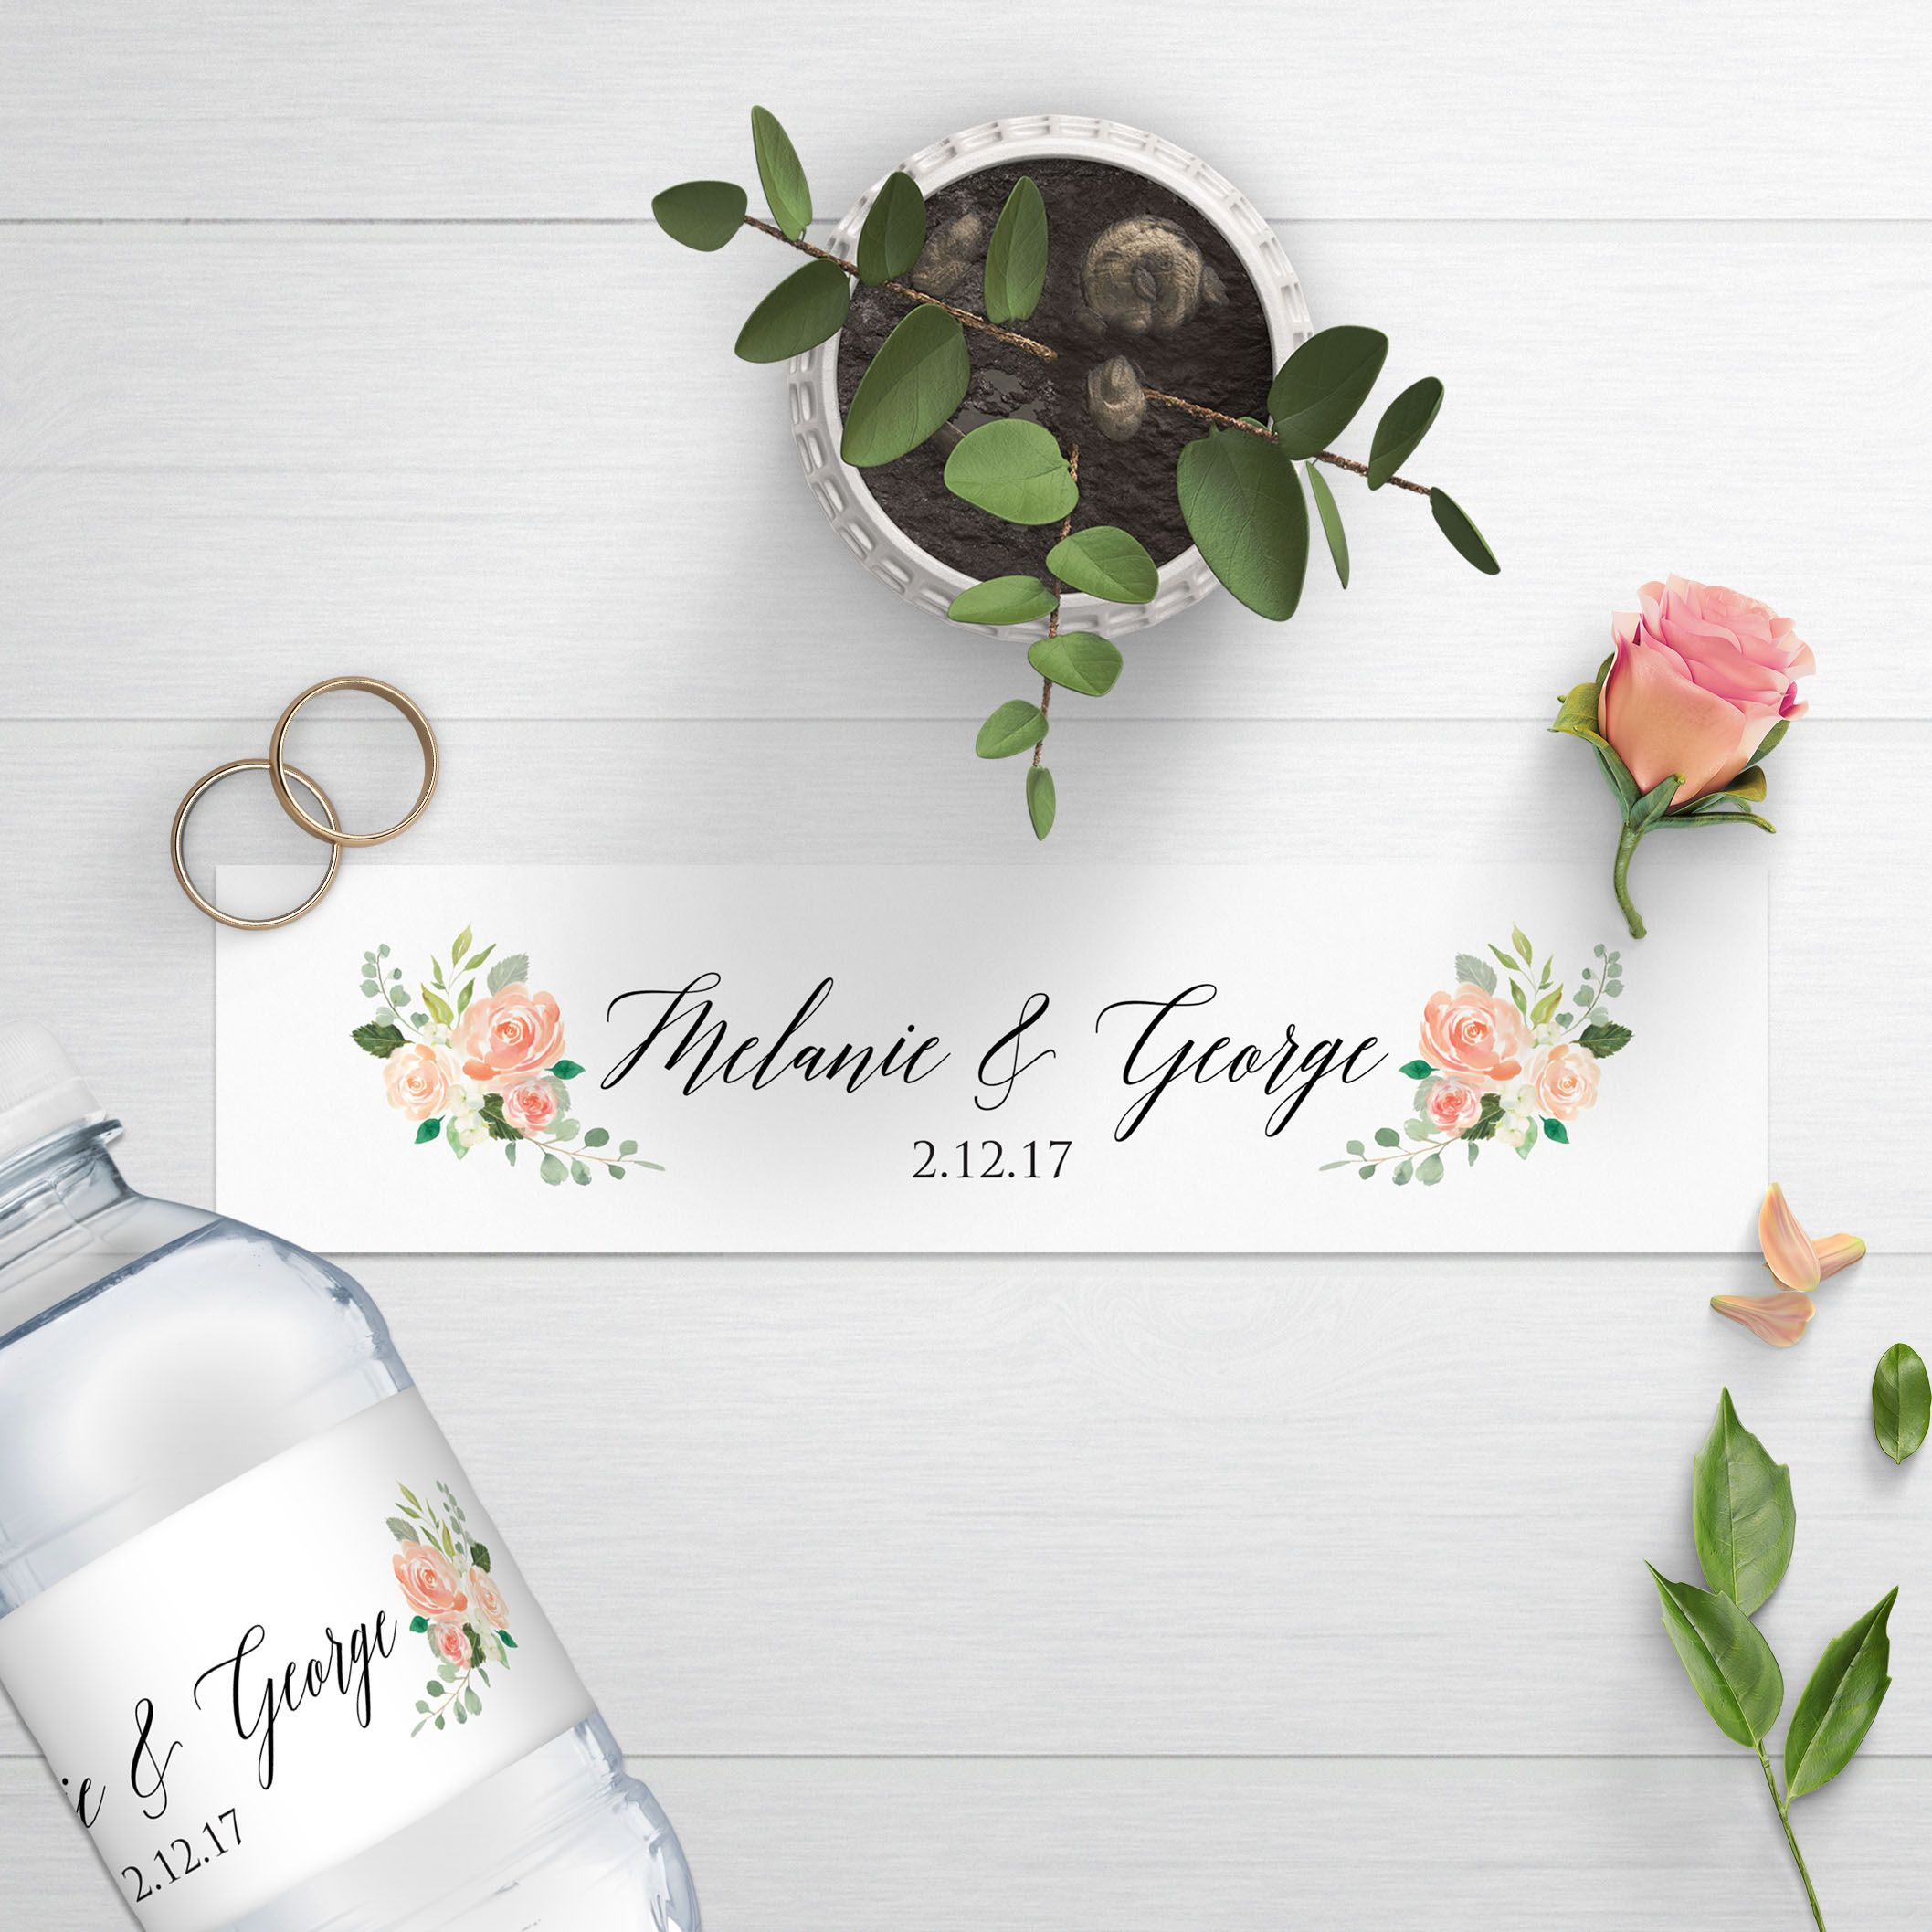 Wedding Water Bottle Labels - DesignedByME on Etsy. | Water Bottle ...